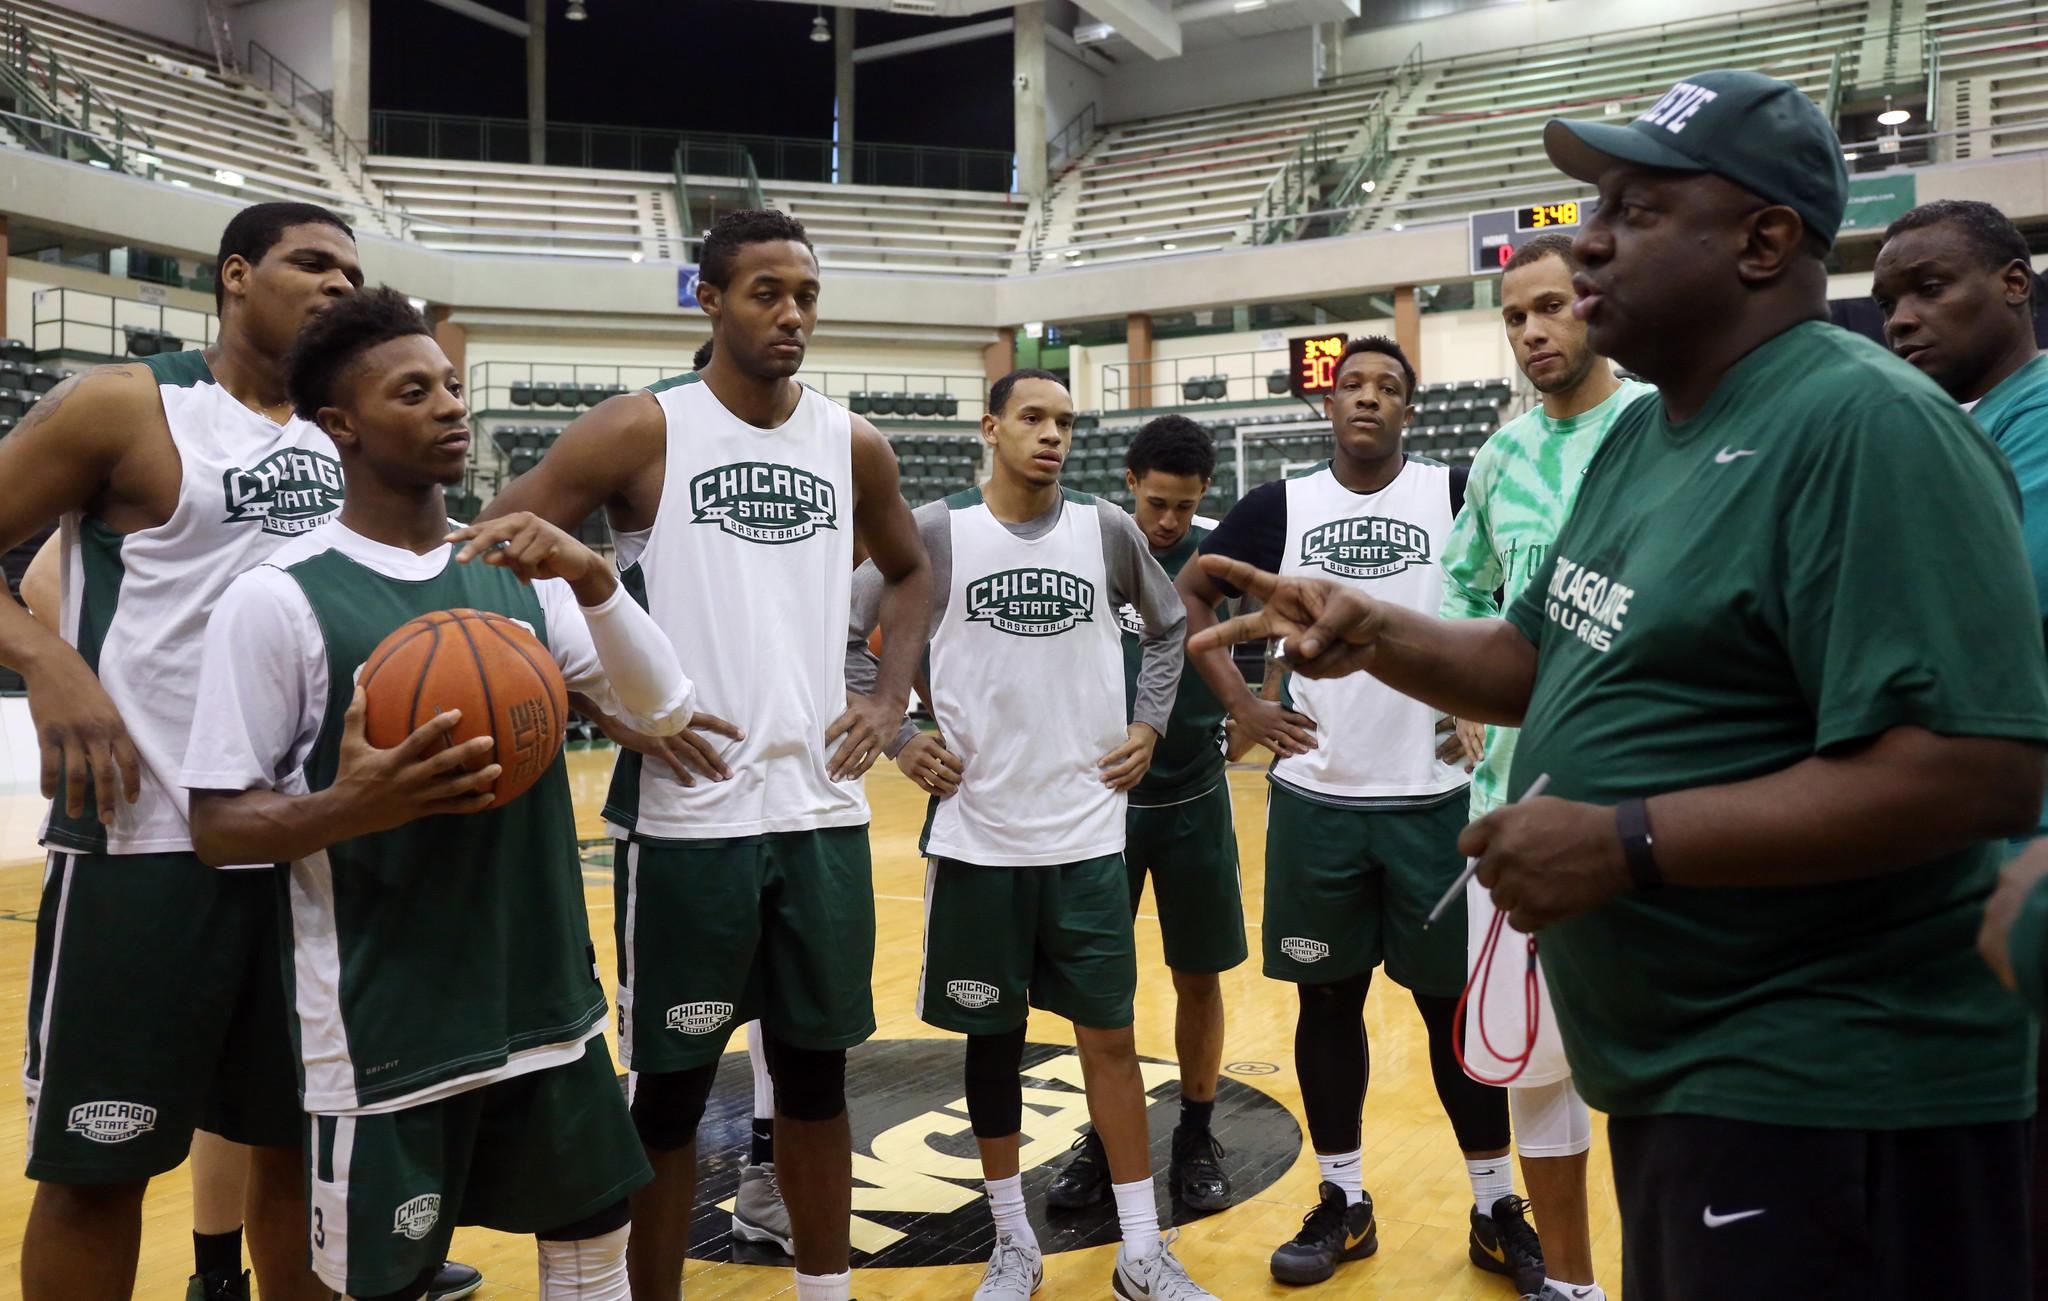 Ct-chicago-state-basketball-budget-debate-spt-0203-20160202